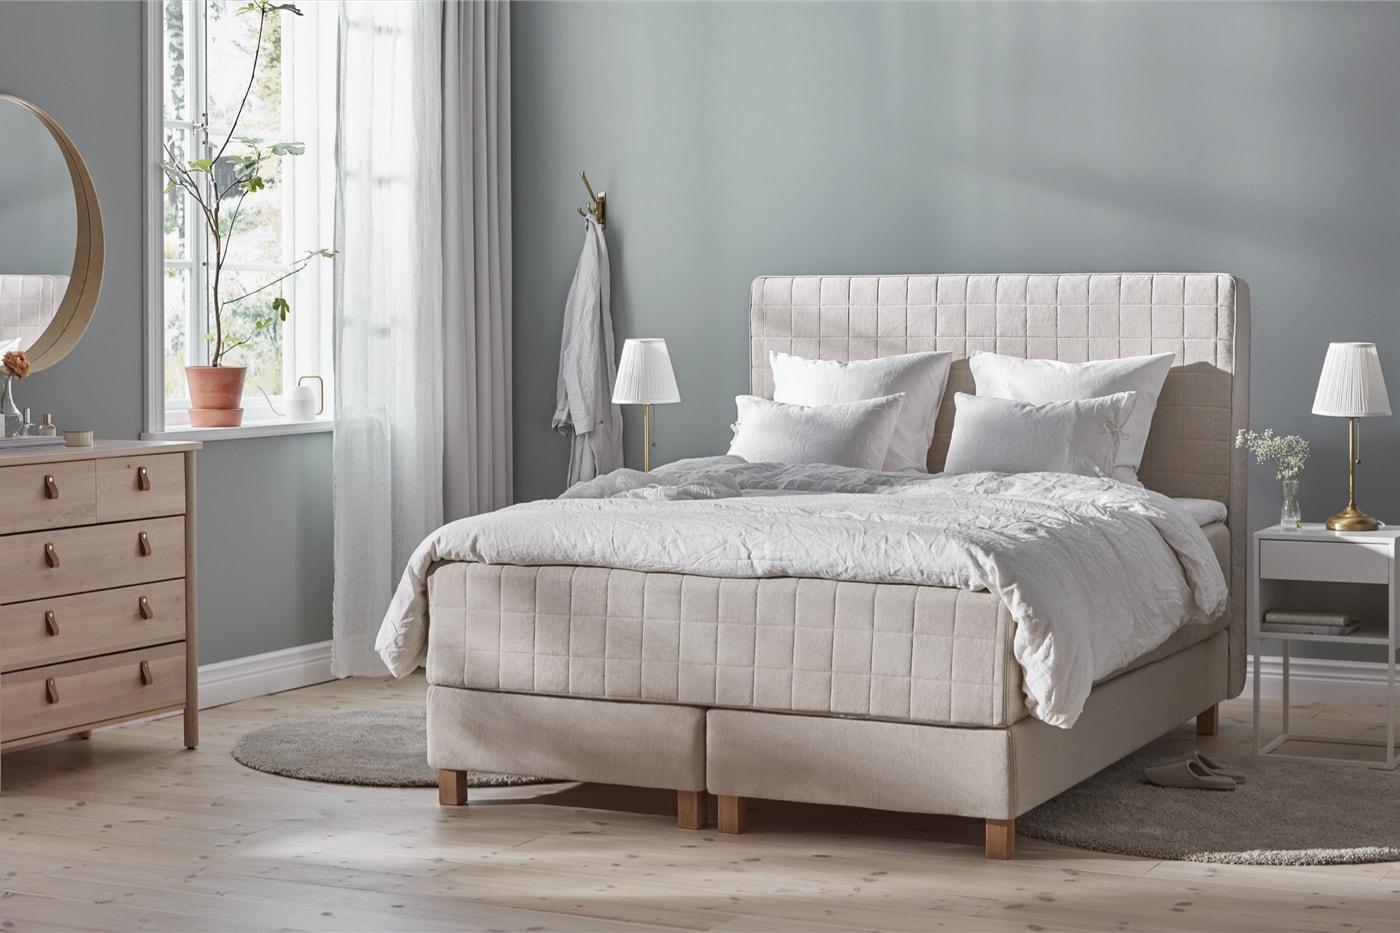 Hervorragend Betten U0026 Matratzen